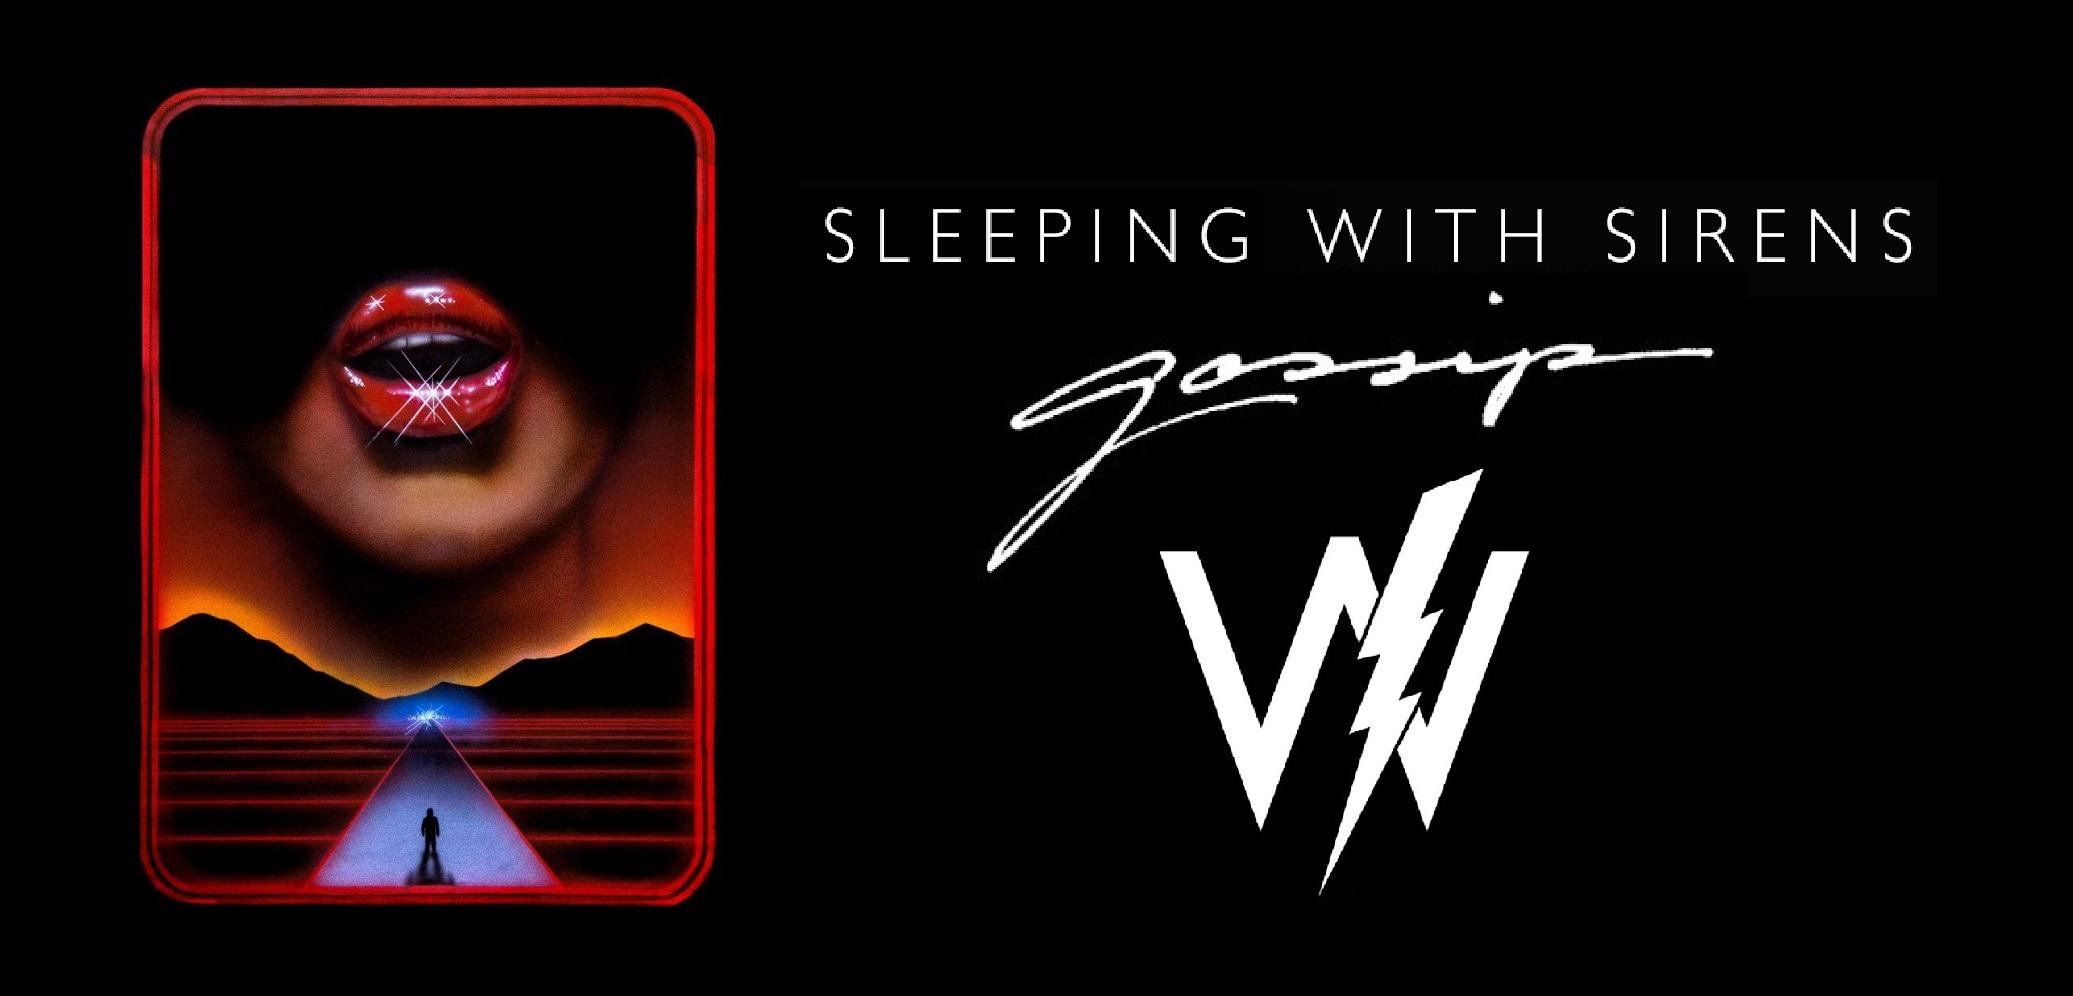 sleeping with sirens gossip